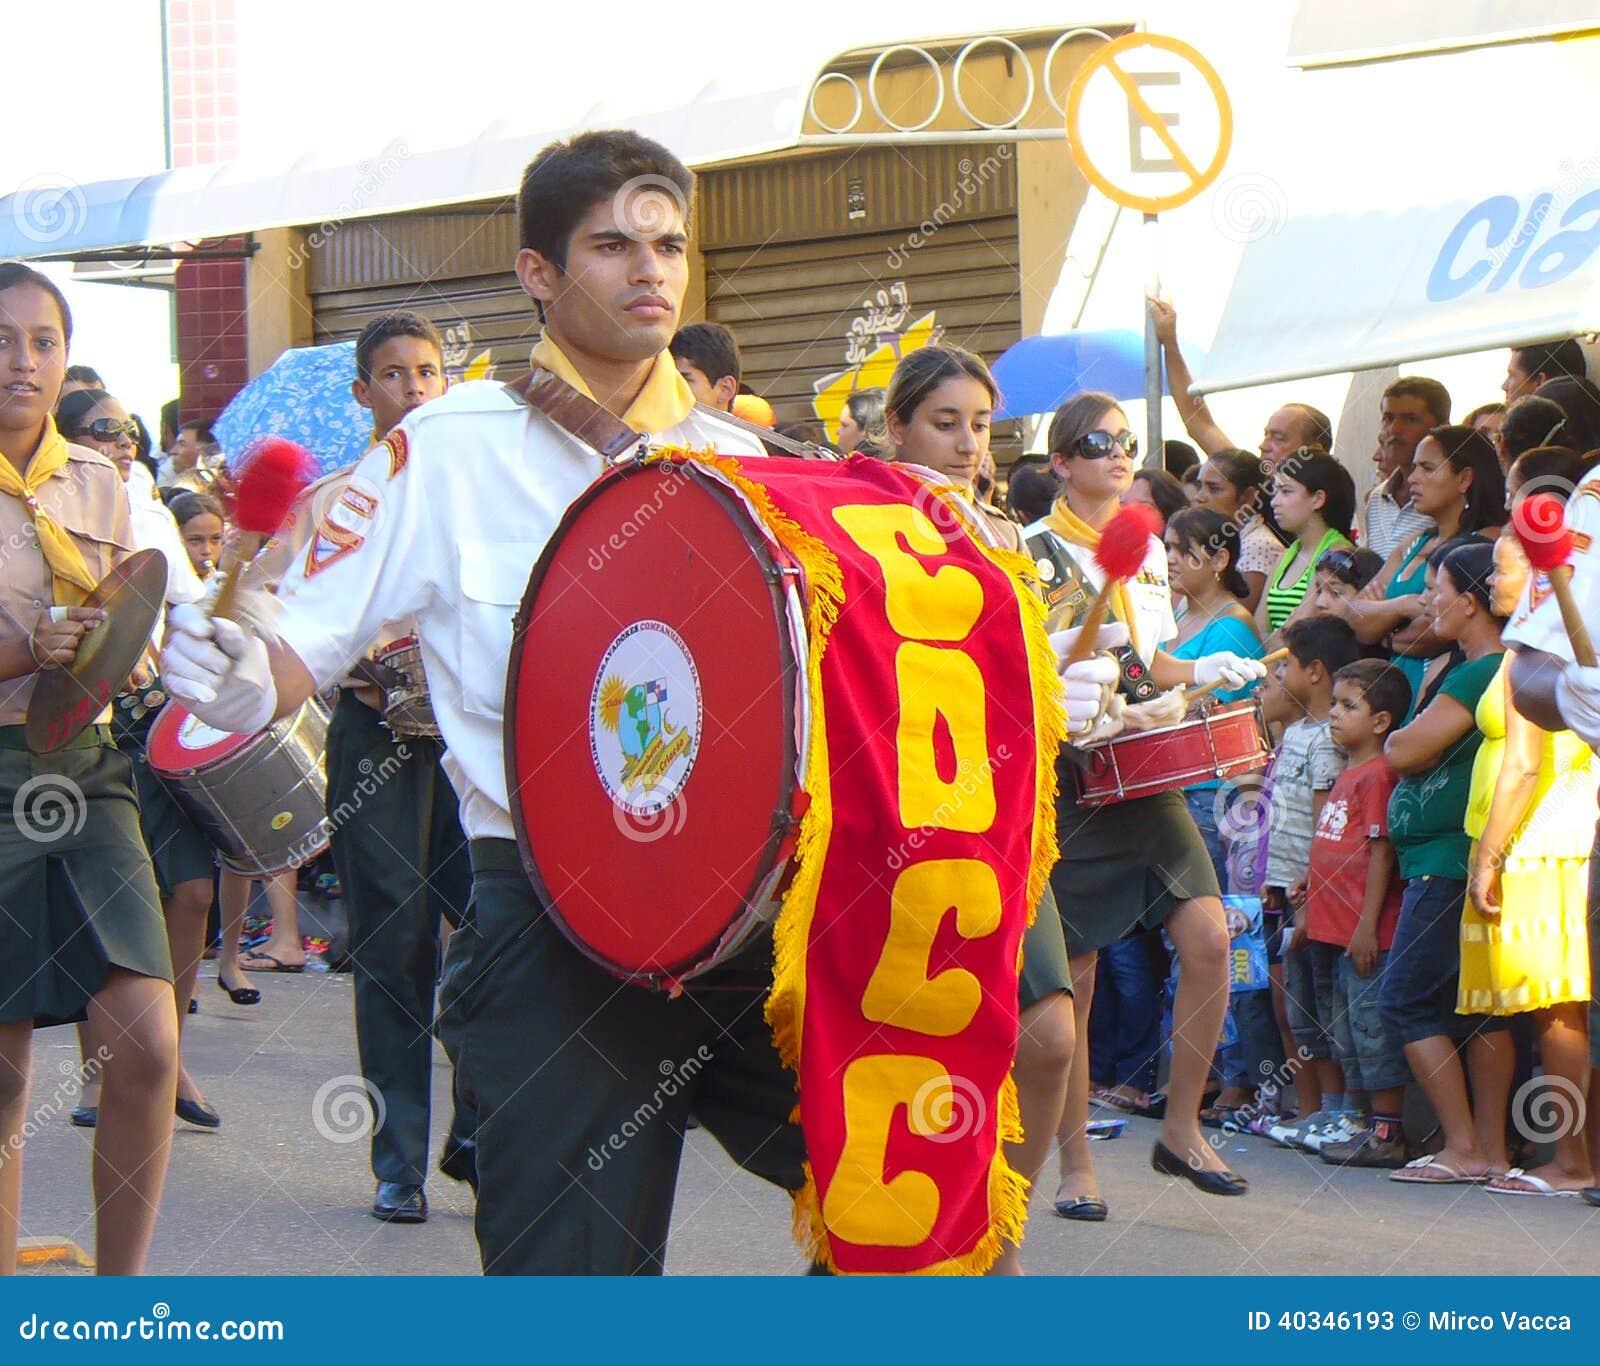 Independence parade